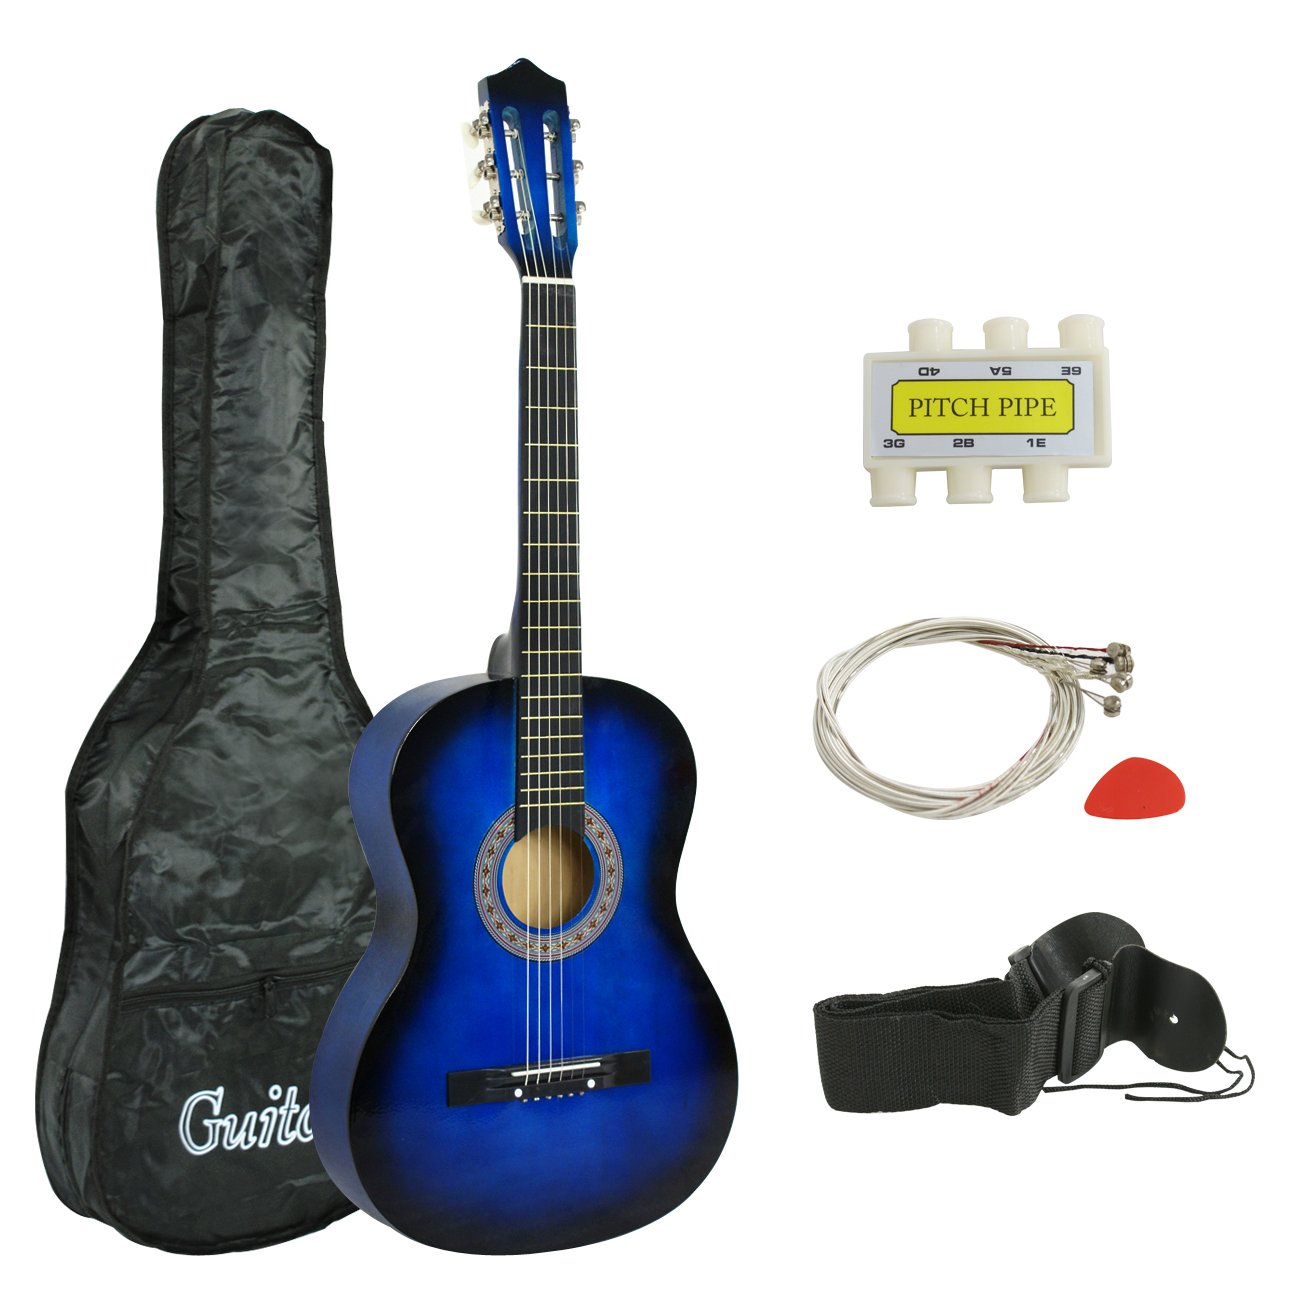 "Smartxchoices Acoustic Guitar for Starter Beginner Music Lovers Kids Gift 38"" 6-String Folk Beginners Acoustic Guitar"